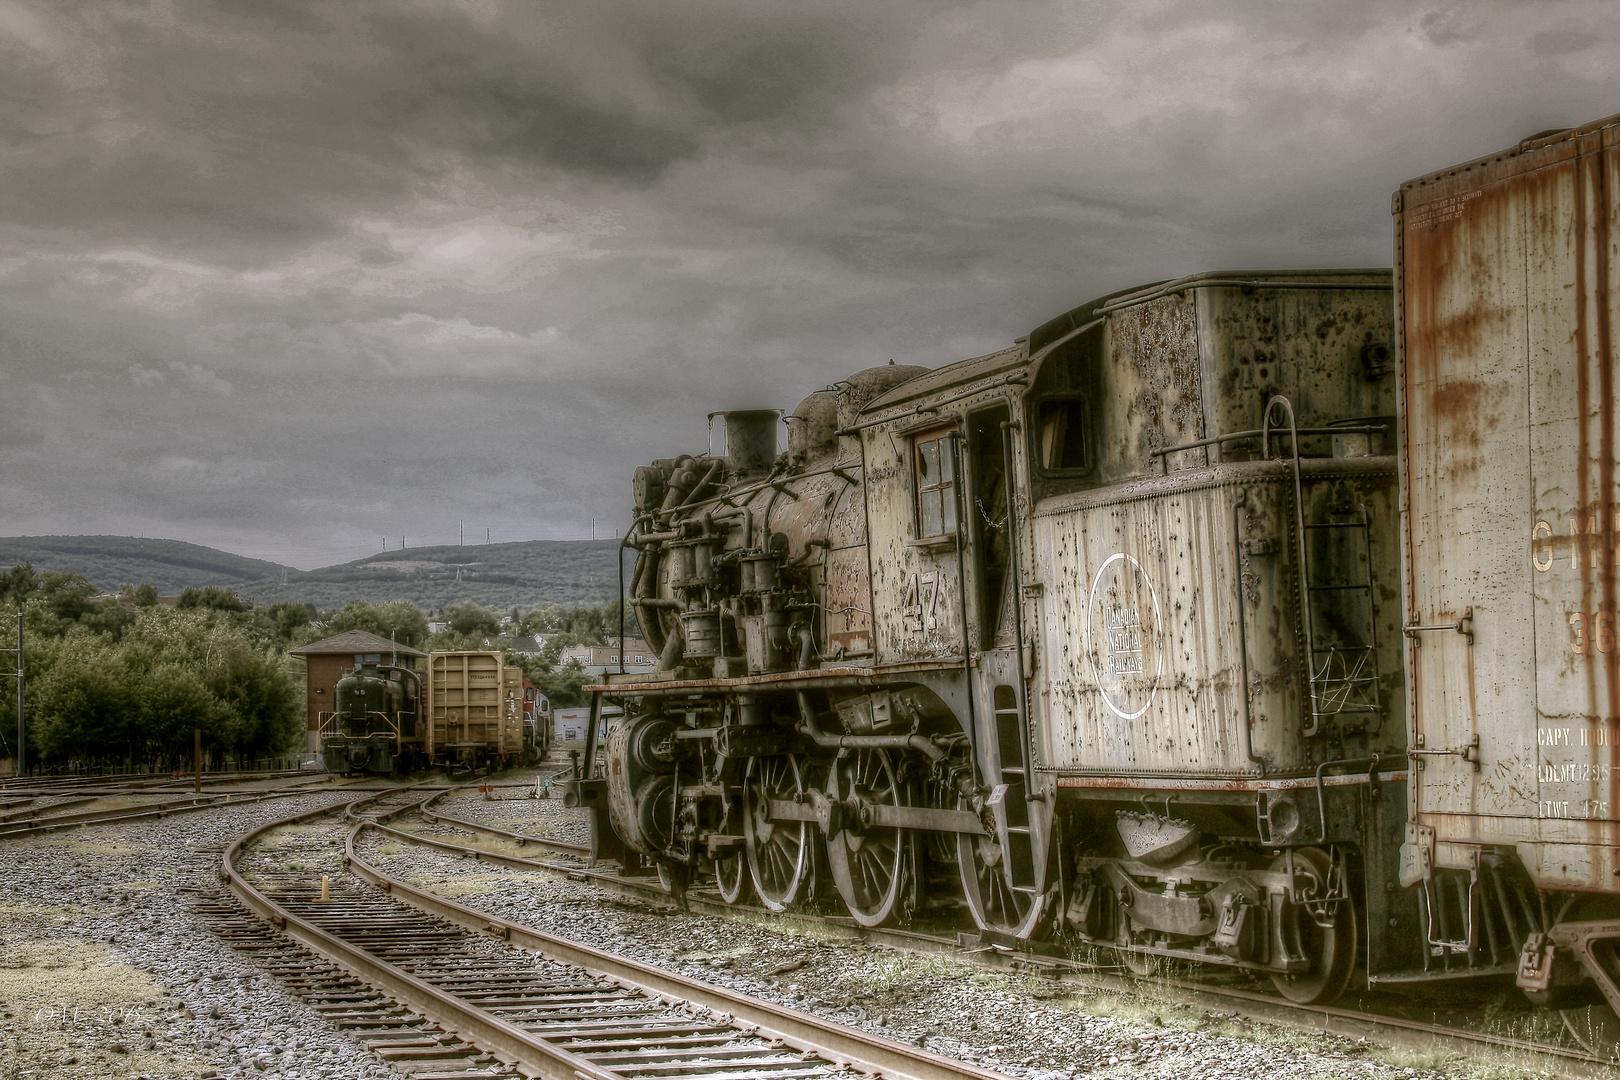 Pennsylvania, Steamtown National Historic Site.